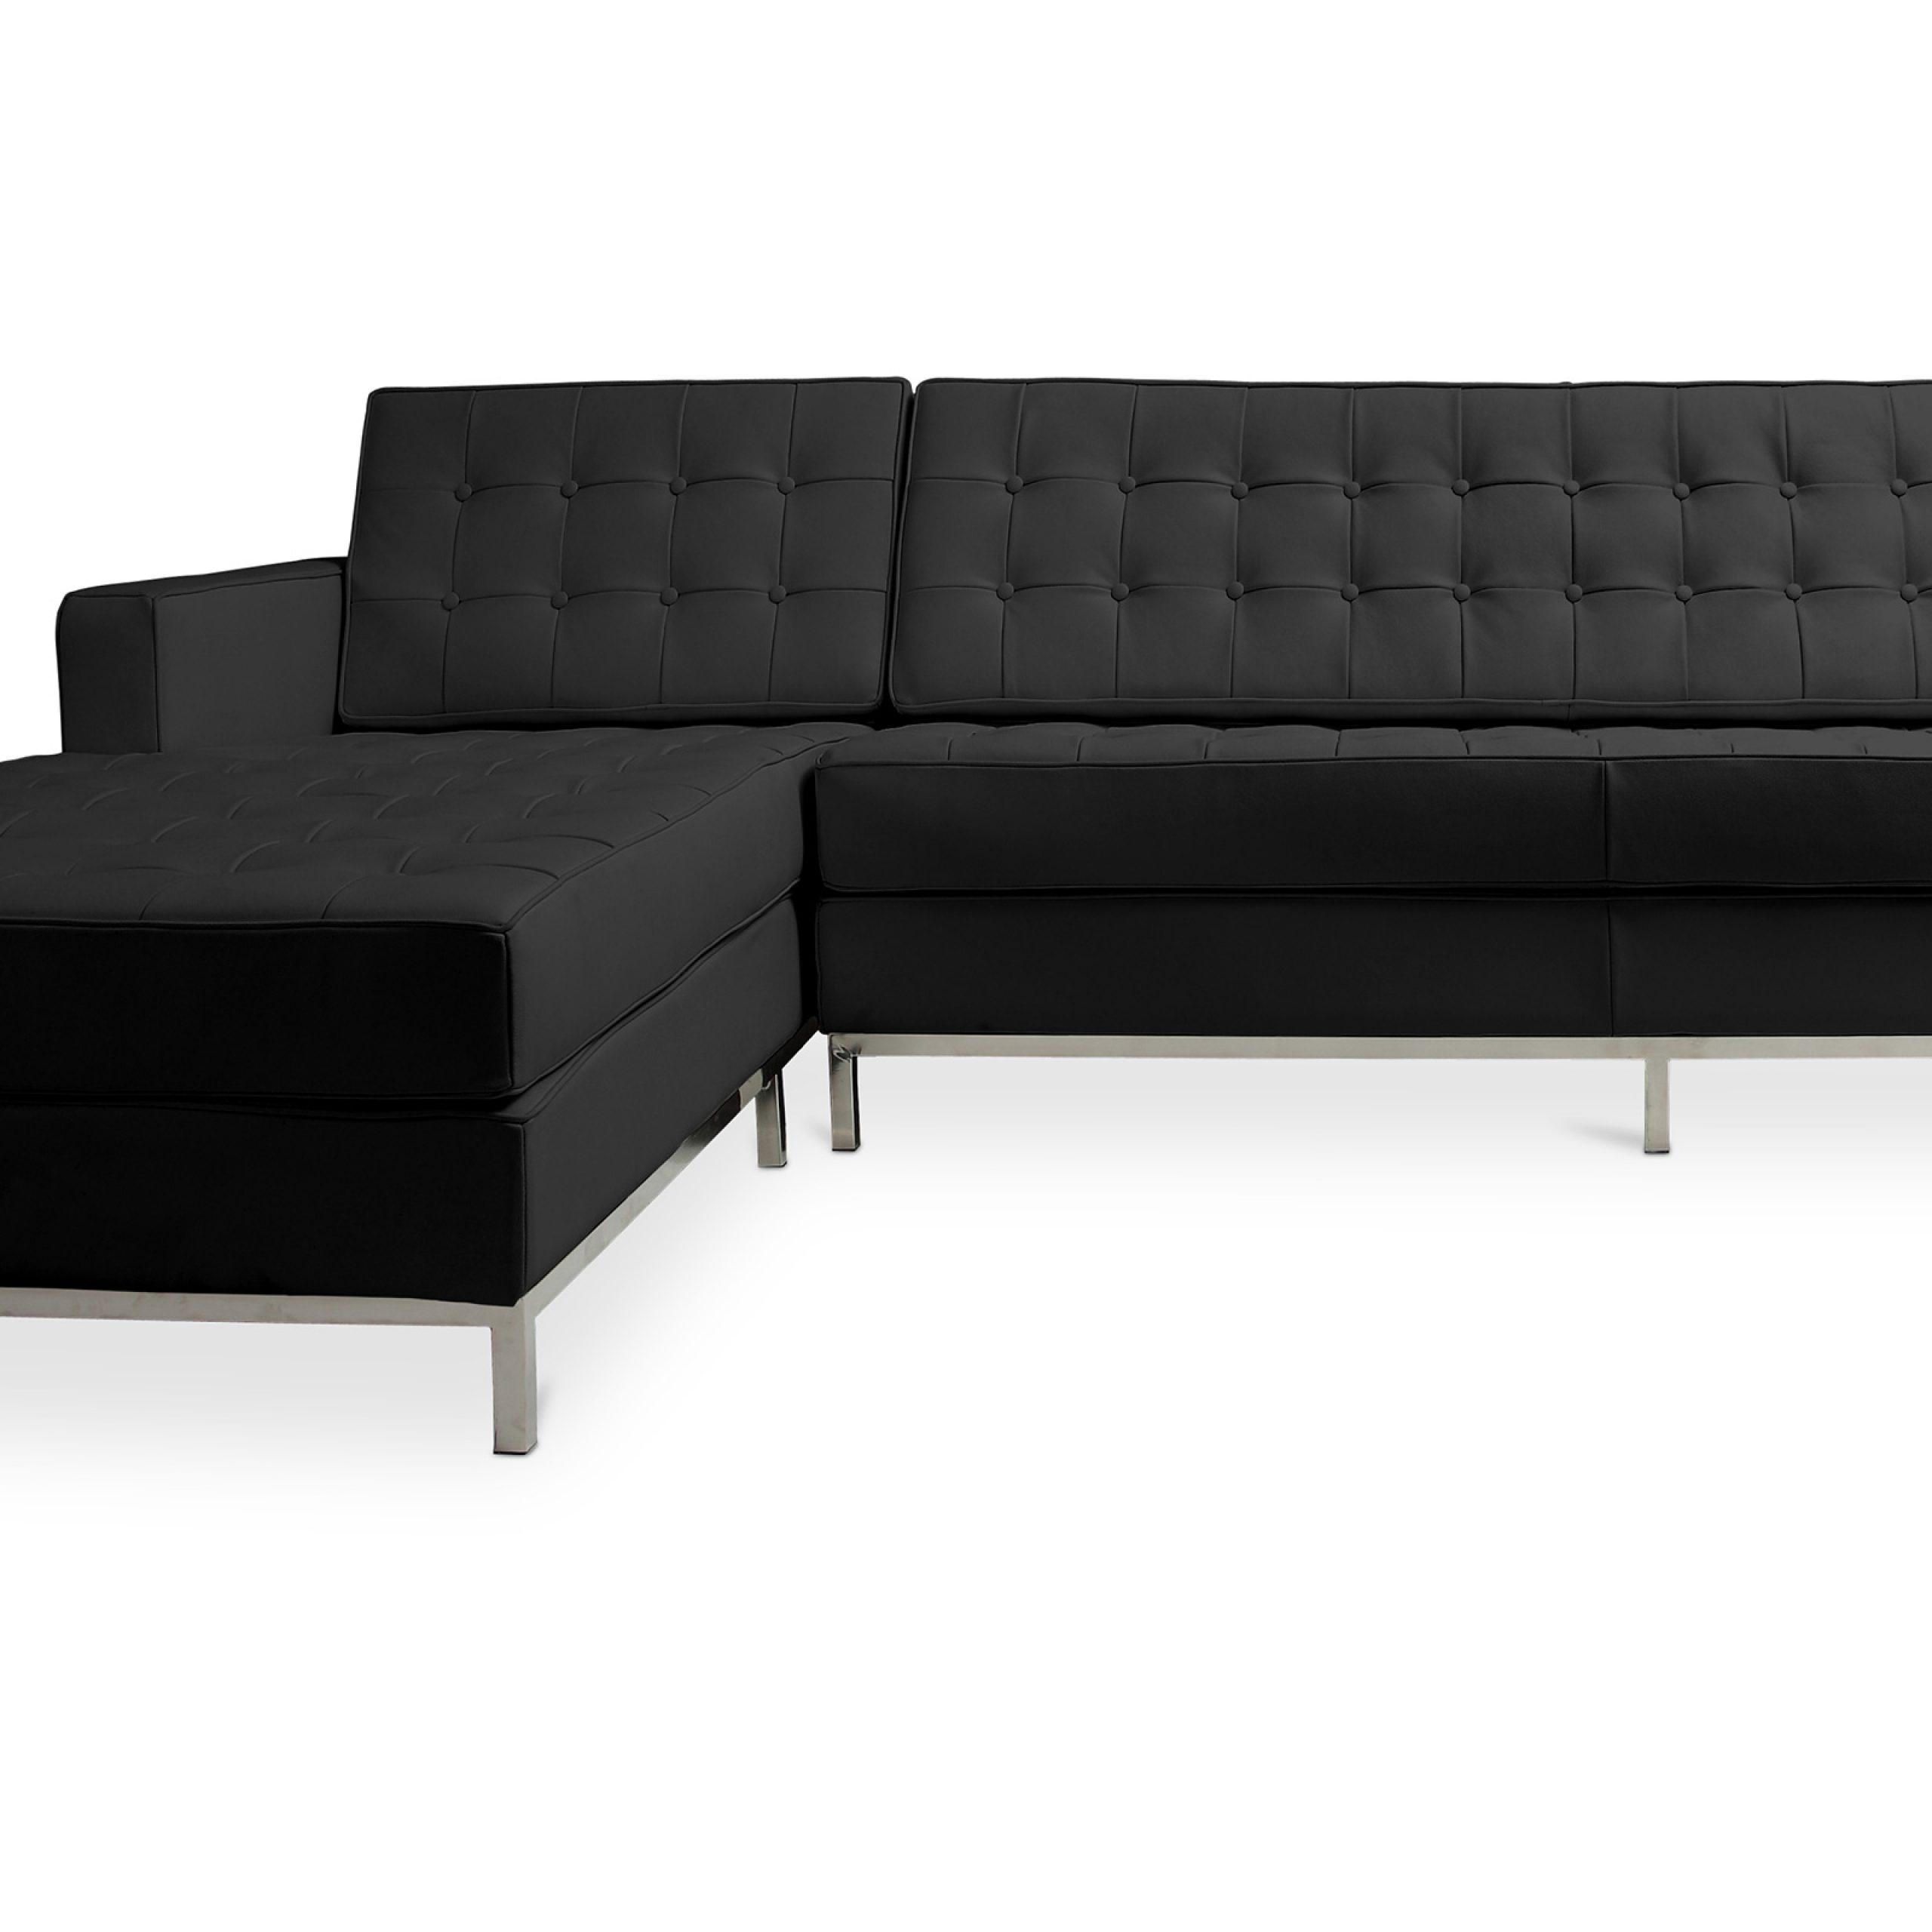 Buy Design Corner Sofa Florence Knoll Style – Left Angle Within Florence Knoll Style Sofas (View 7 of 15)